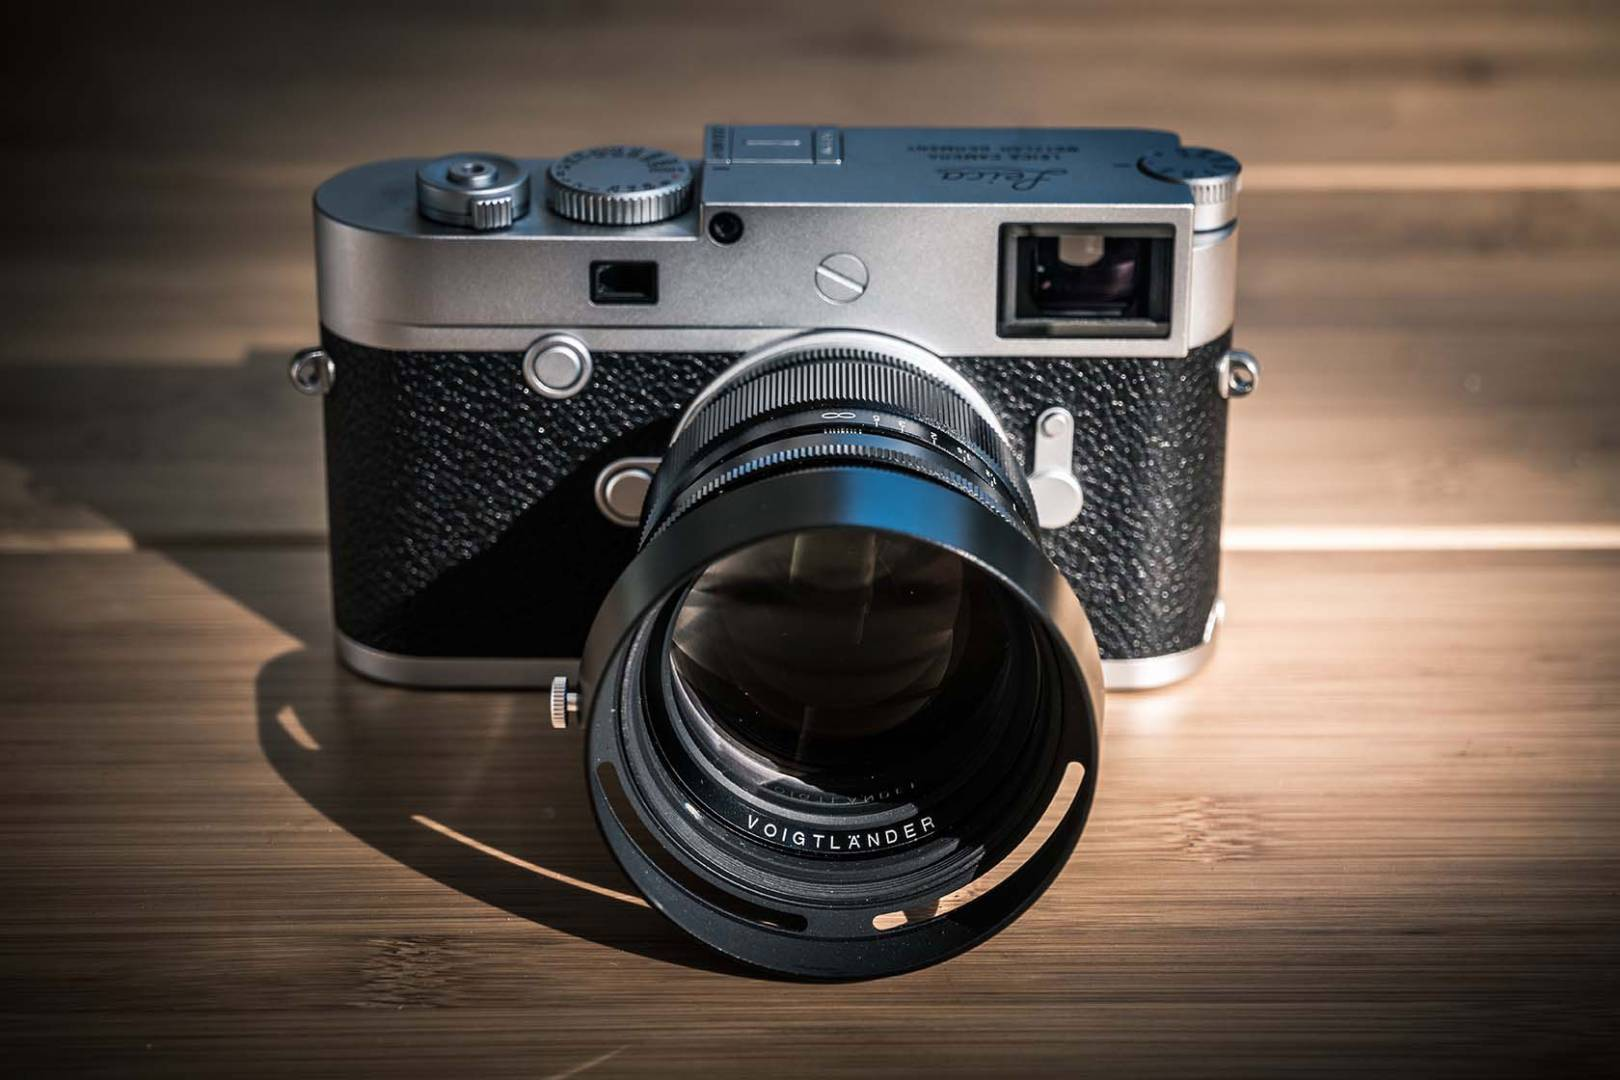 Voigtlaender 75mm Nokton on Leica M10-P